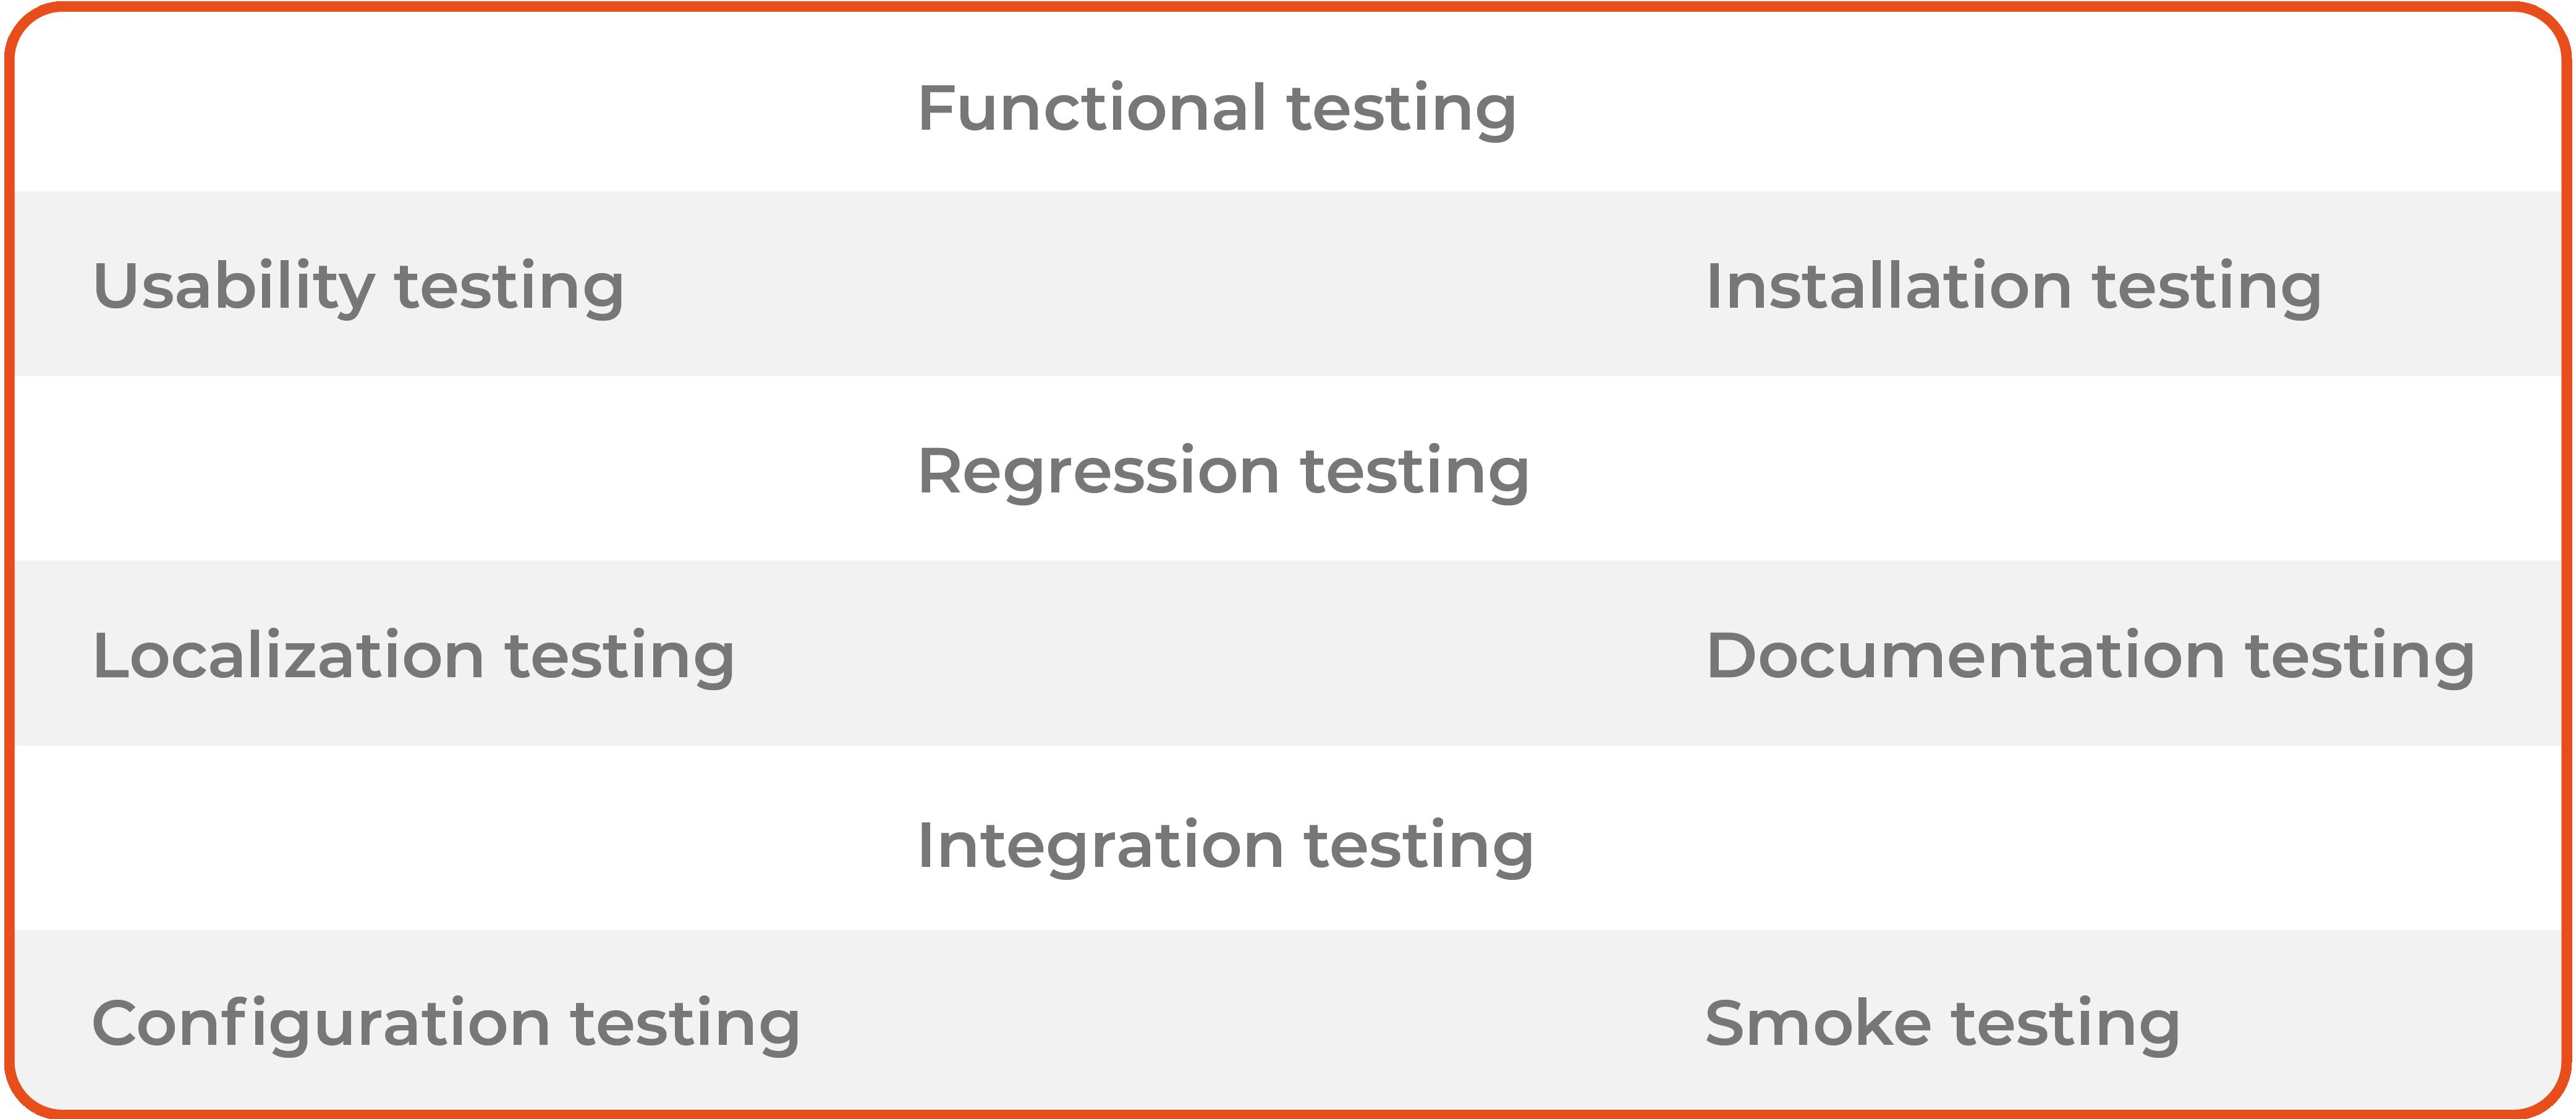 QA functional testing